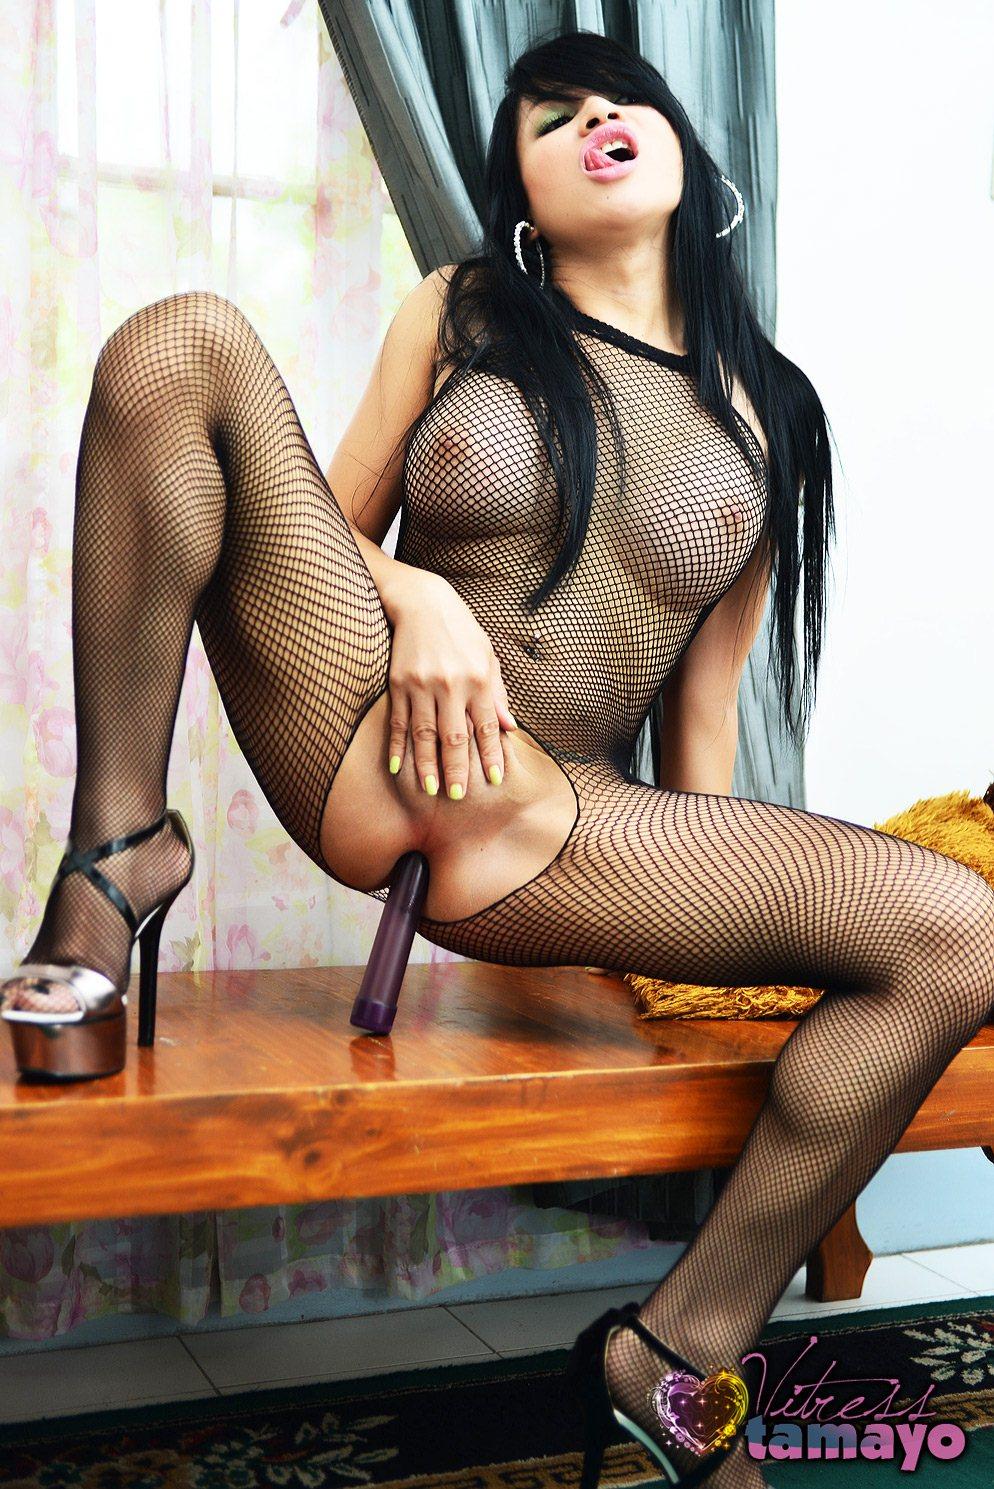 gay cheating porn